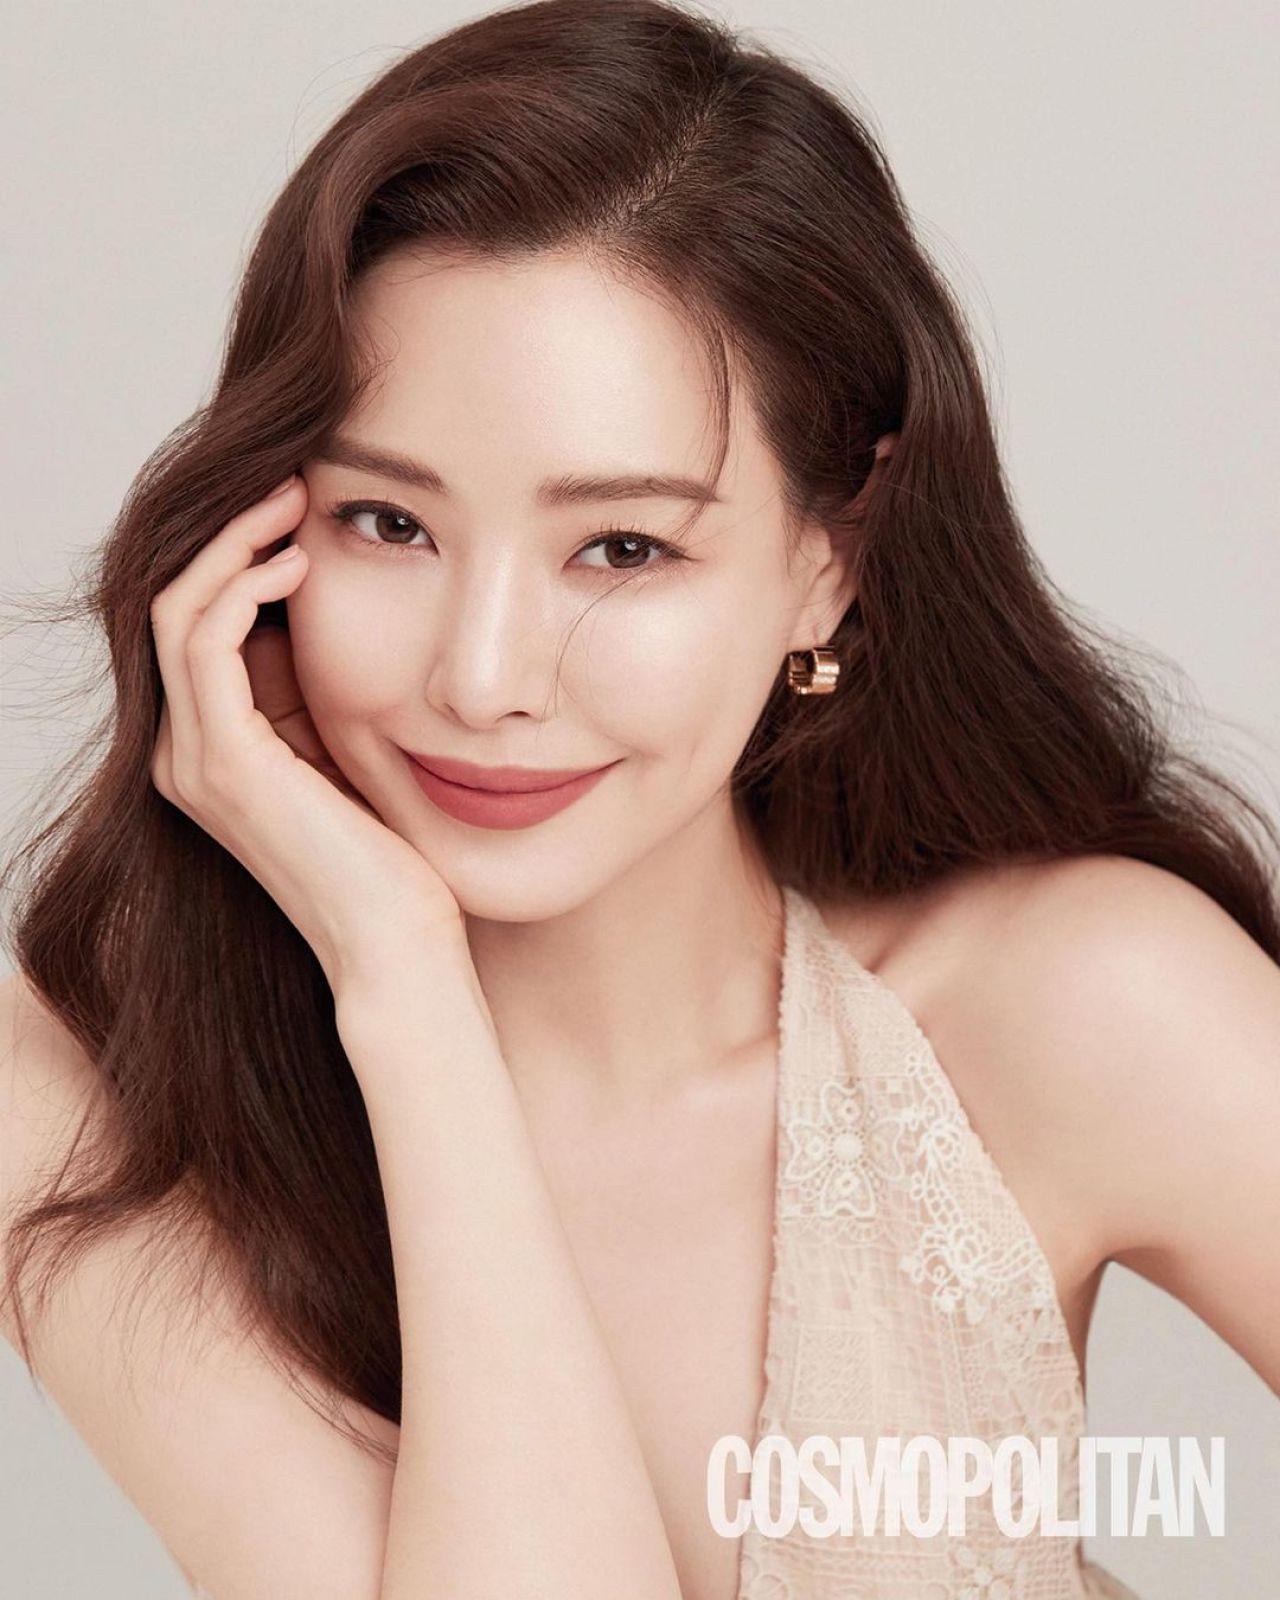 Lee Ha Nui - Cosmopolitan Magazine May 2021 • CelebMafia